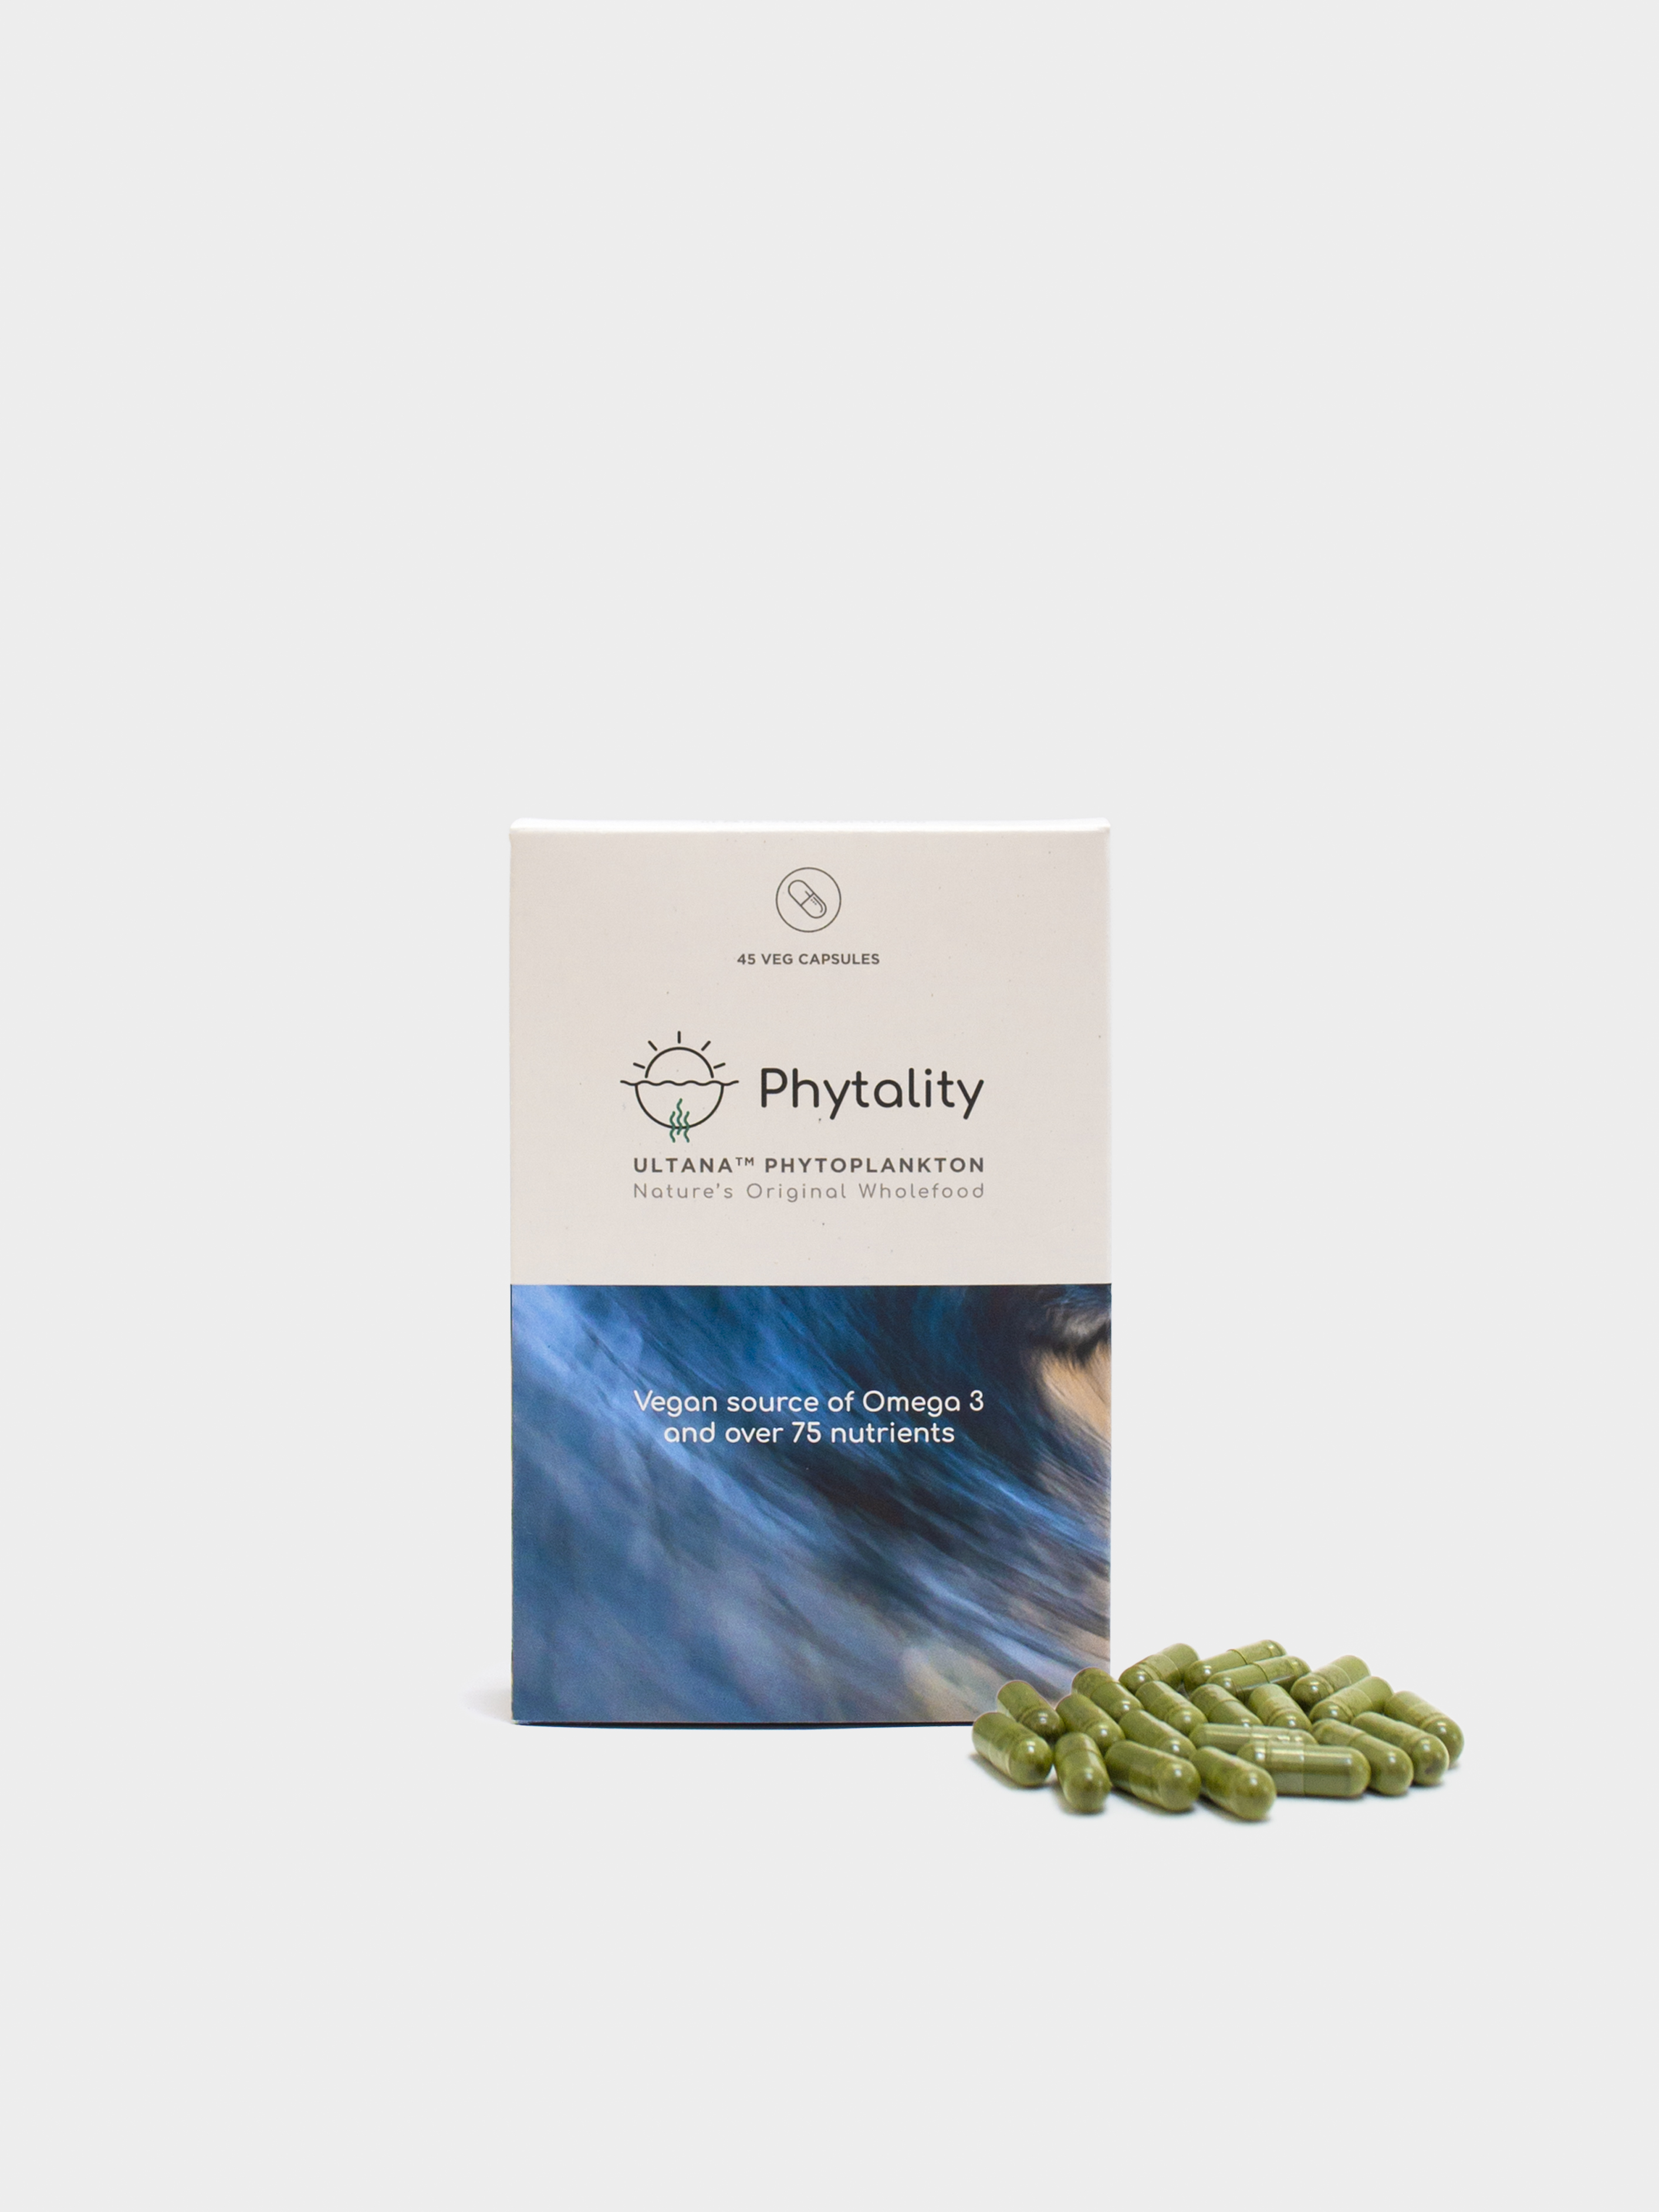 Phytality Ultana Phytoplankton 45 Vegan Caps